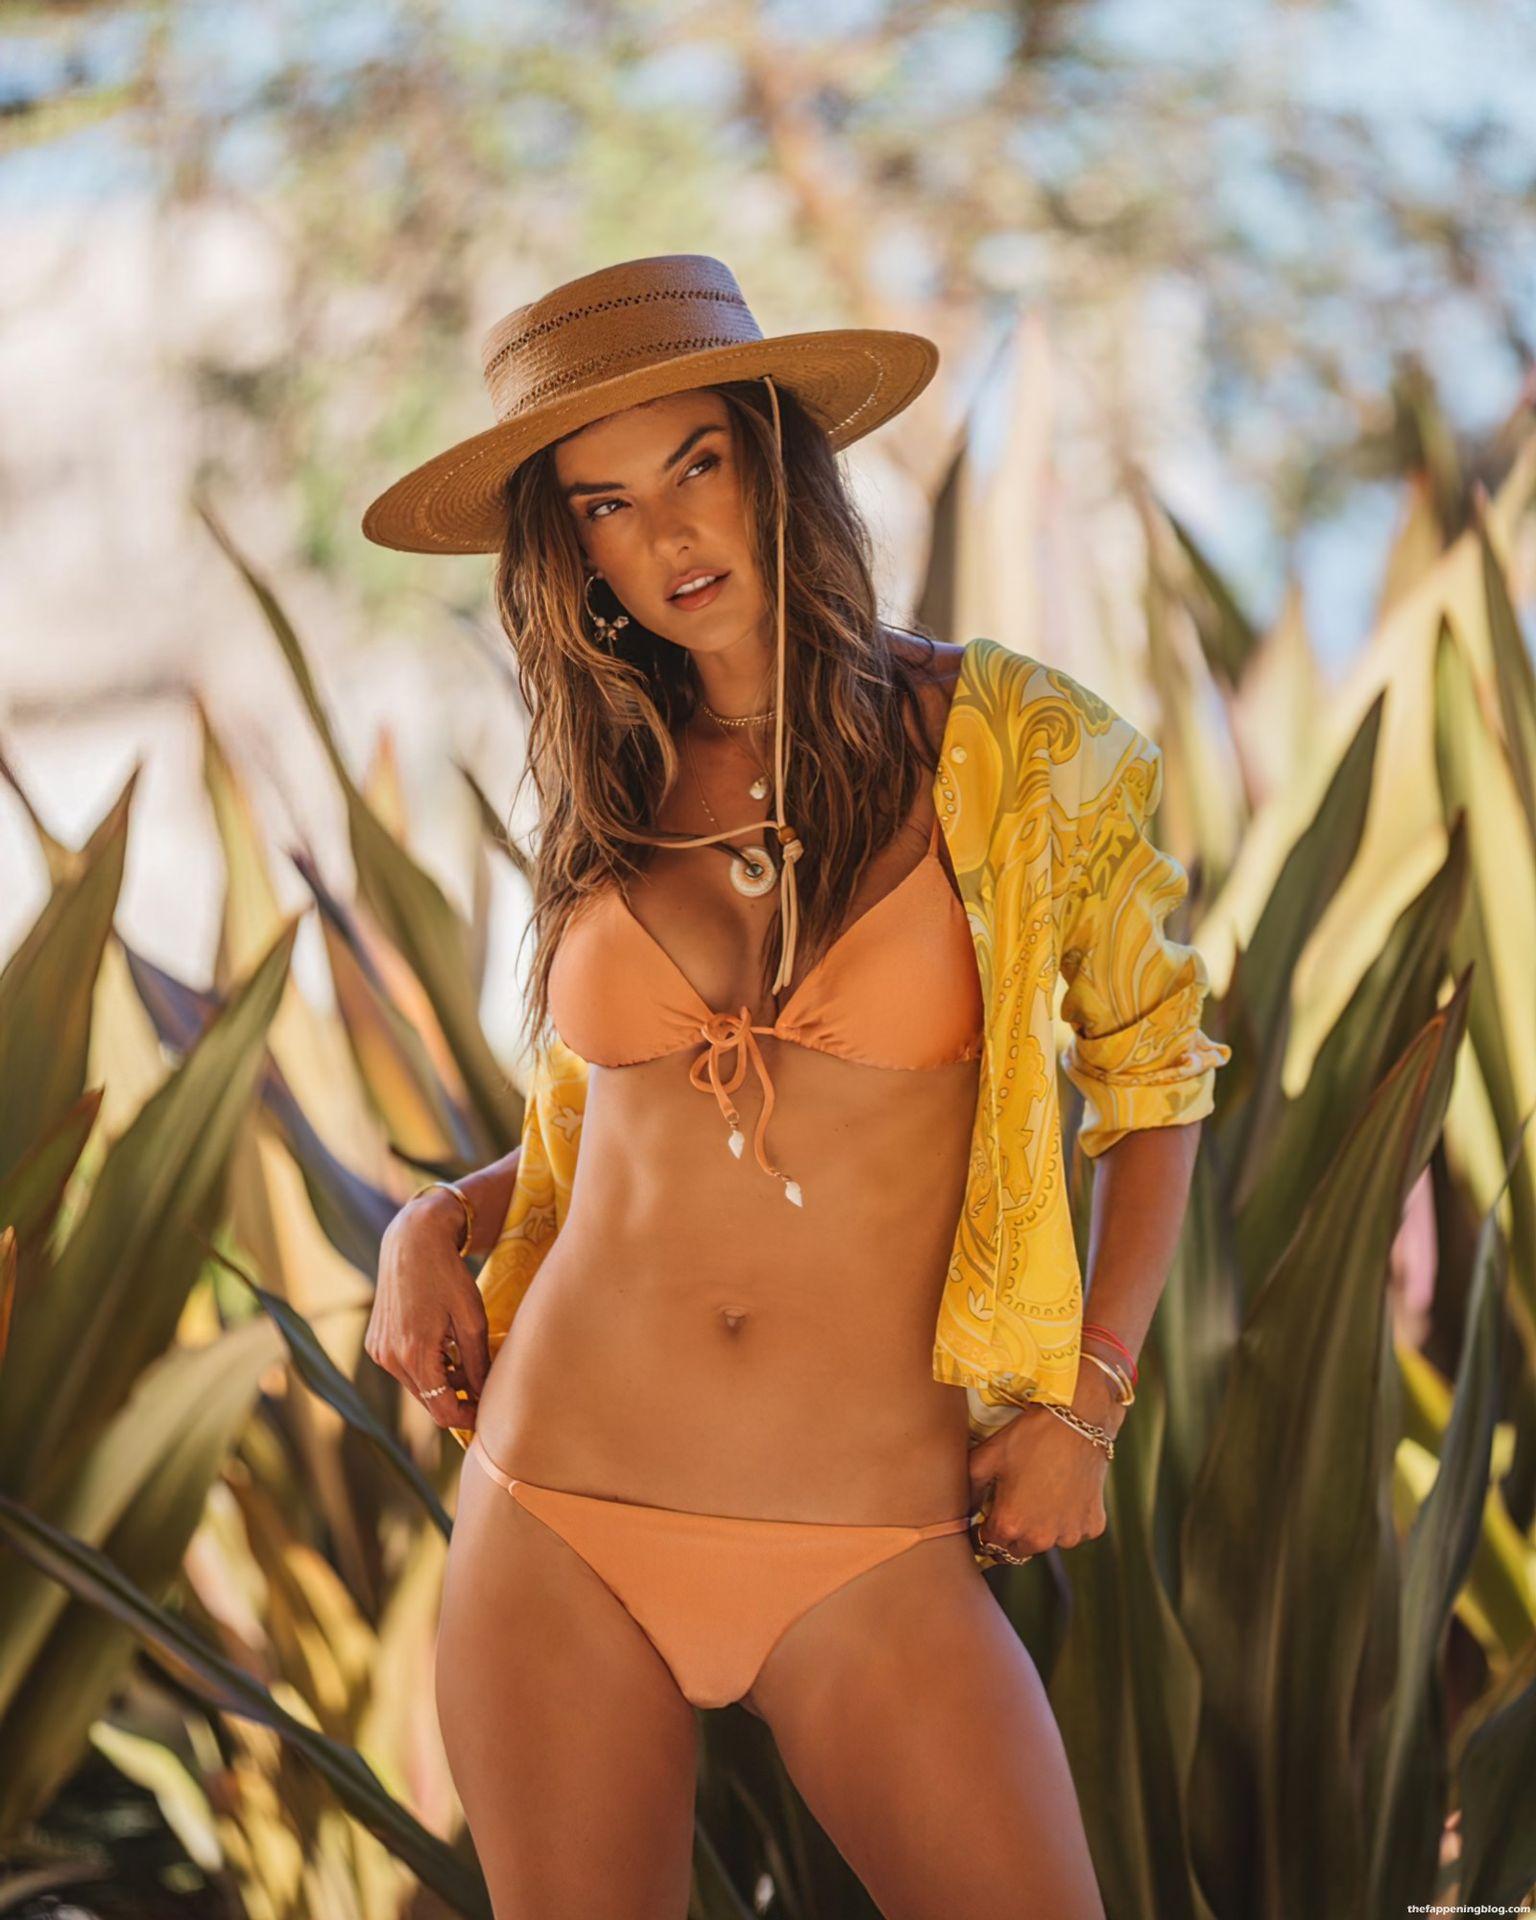 Alessandra-Ambrosio-Sexy-Bikinis-2-thefappeningblog.com_.jpg